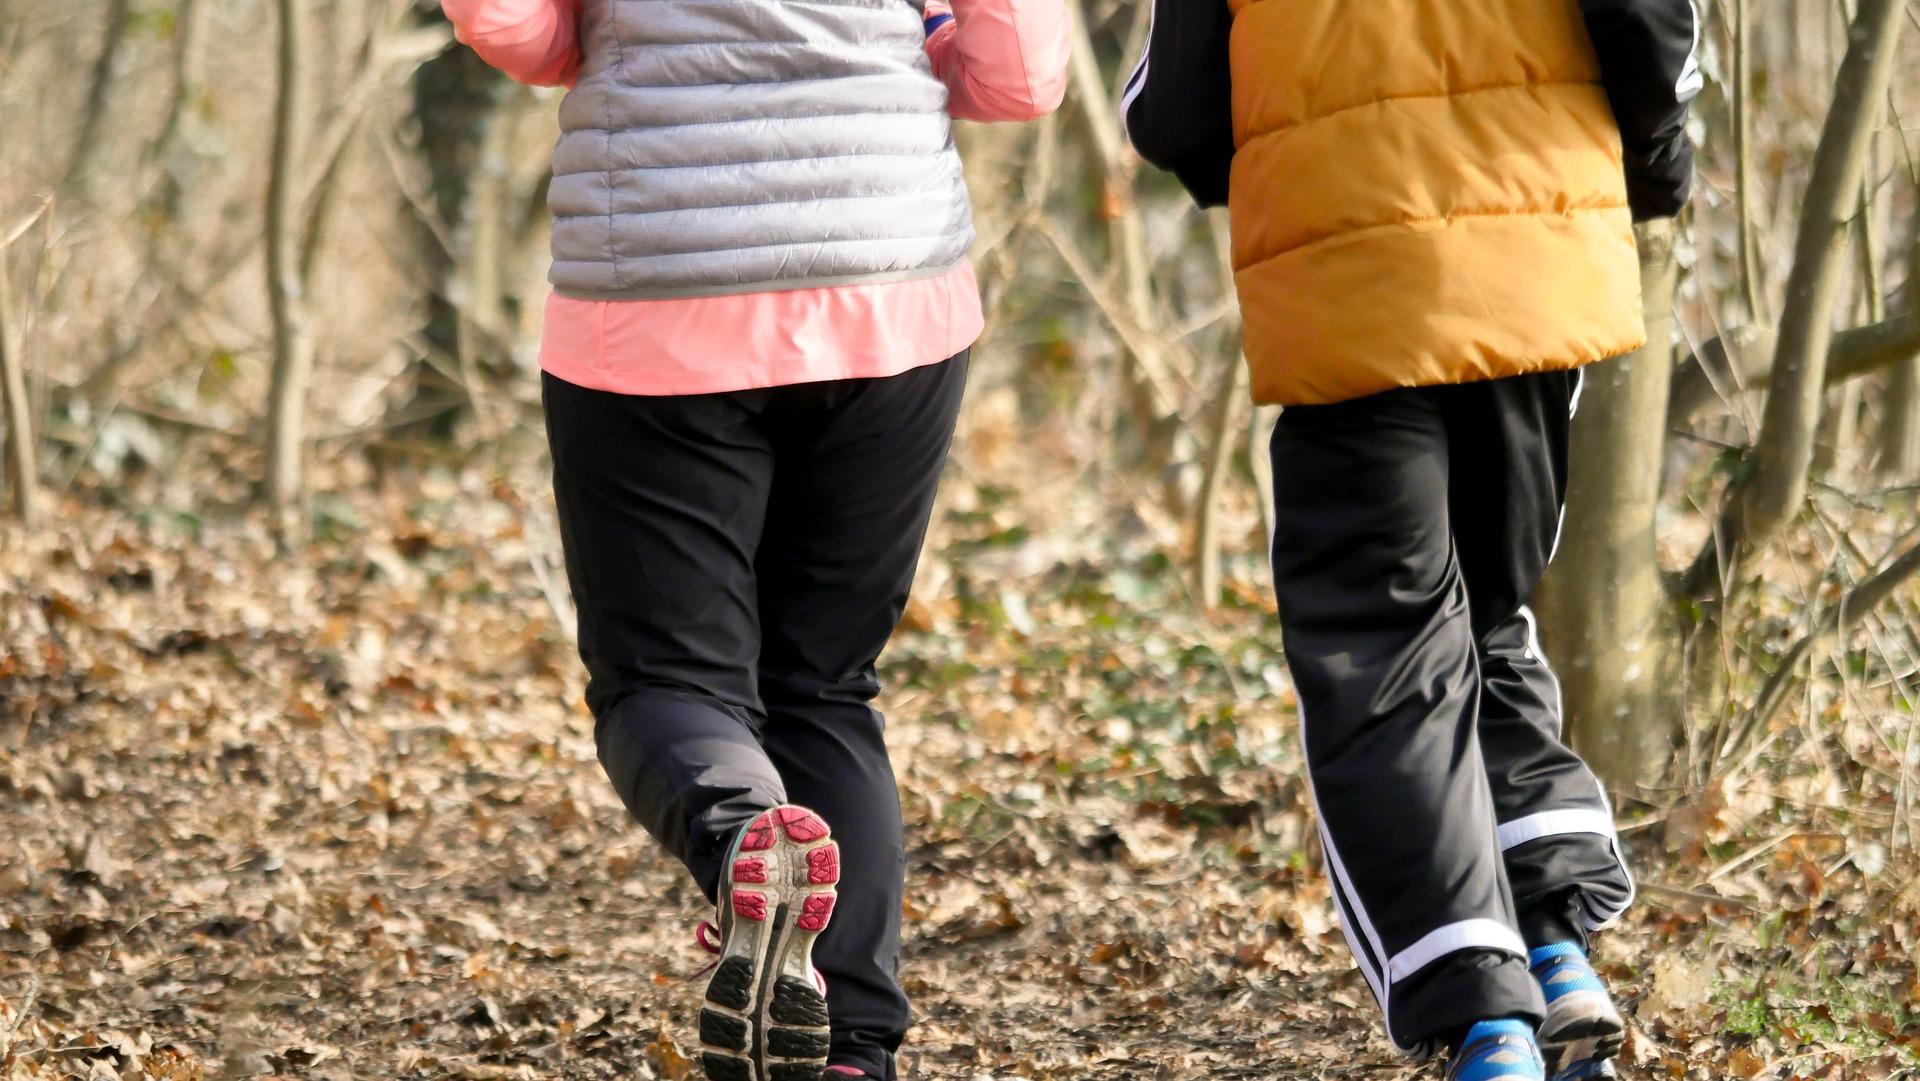 1590837521-jogging-3216189-1920.jpeg